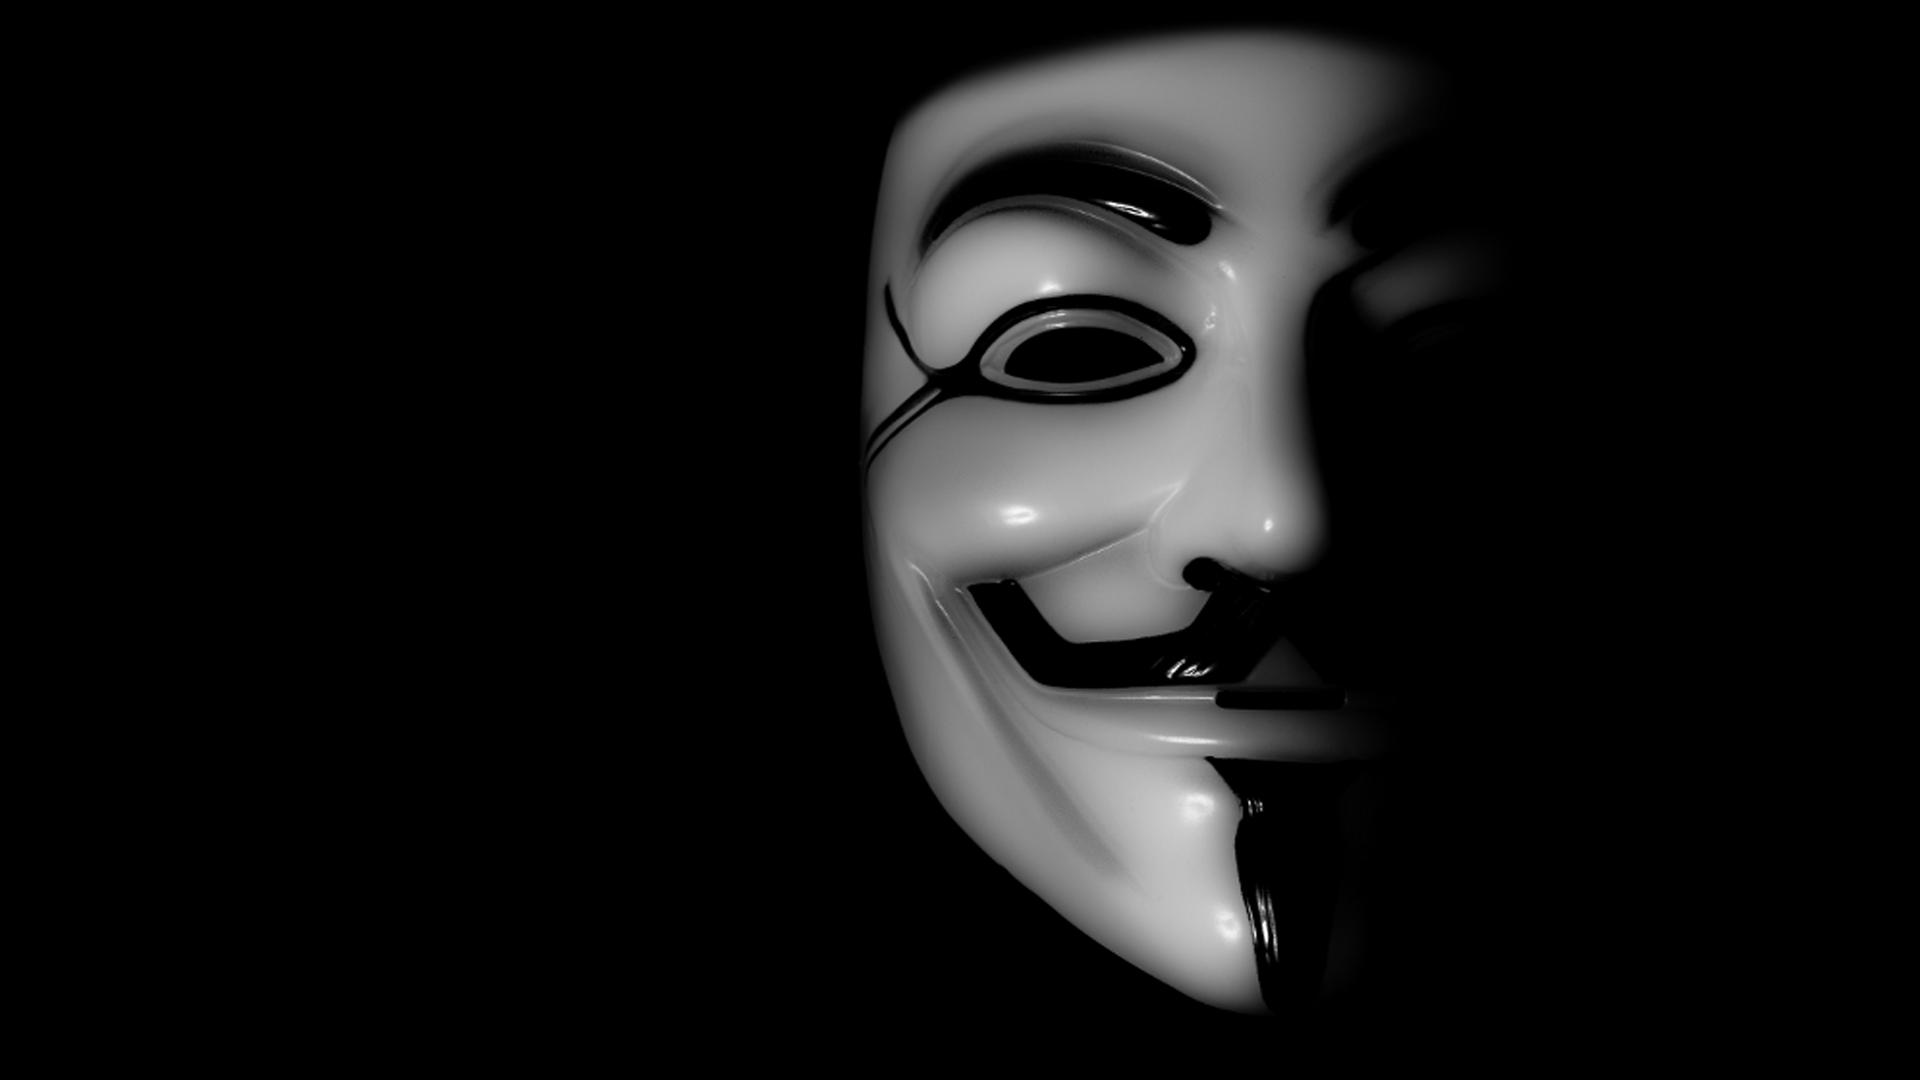 Hd wallpaper joker - Anonymous Hd Wallpaper 1920x1080 Wallpapersafari